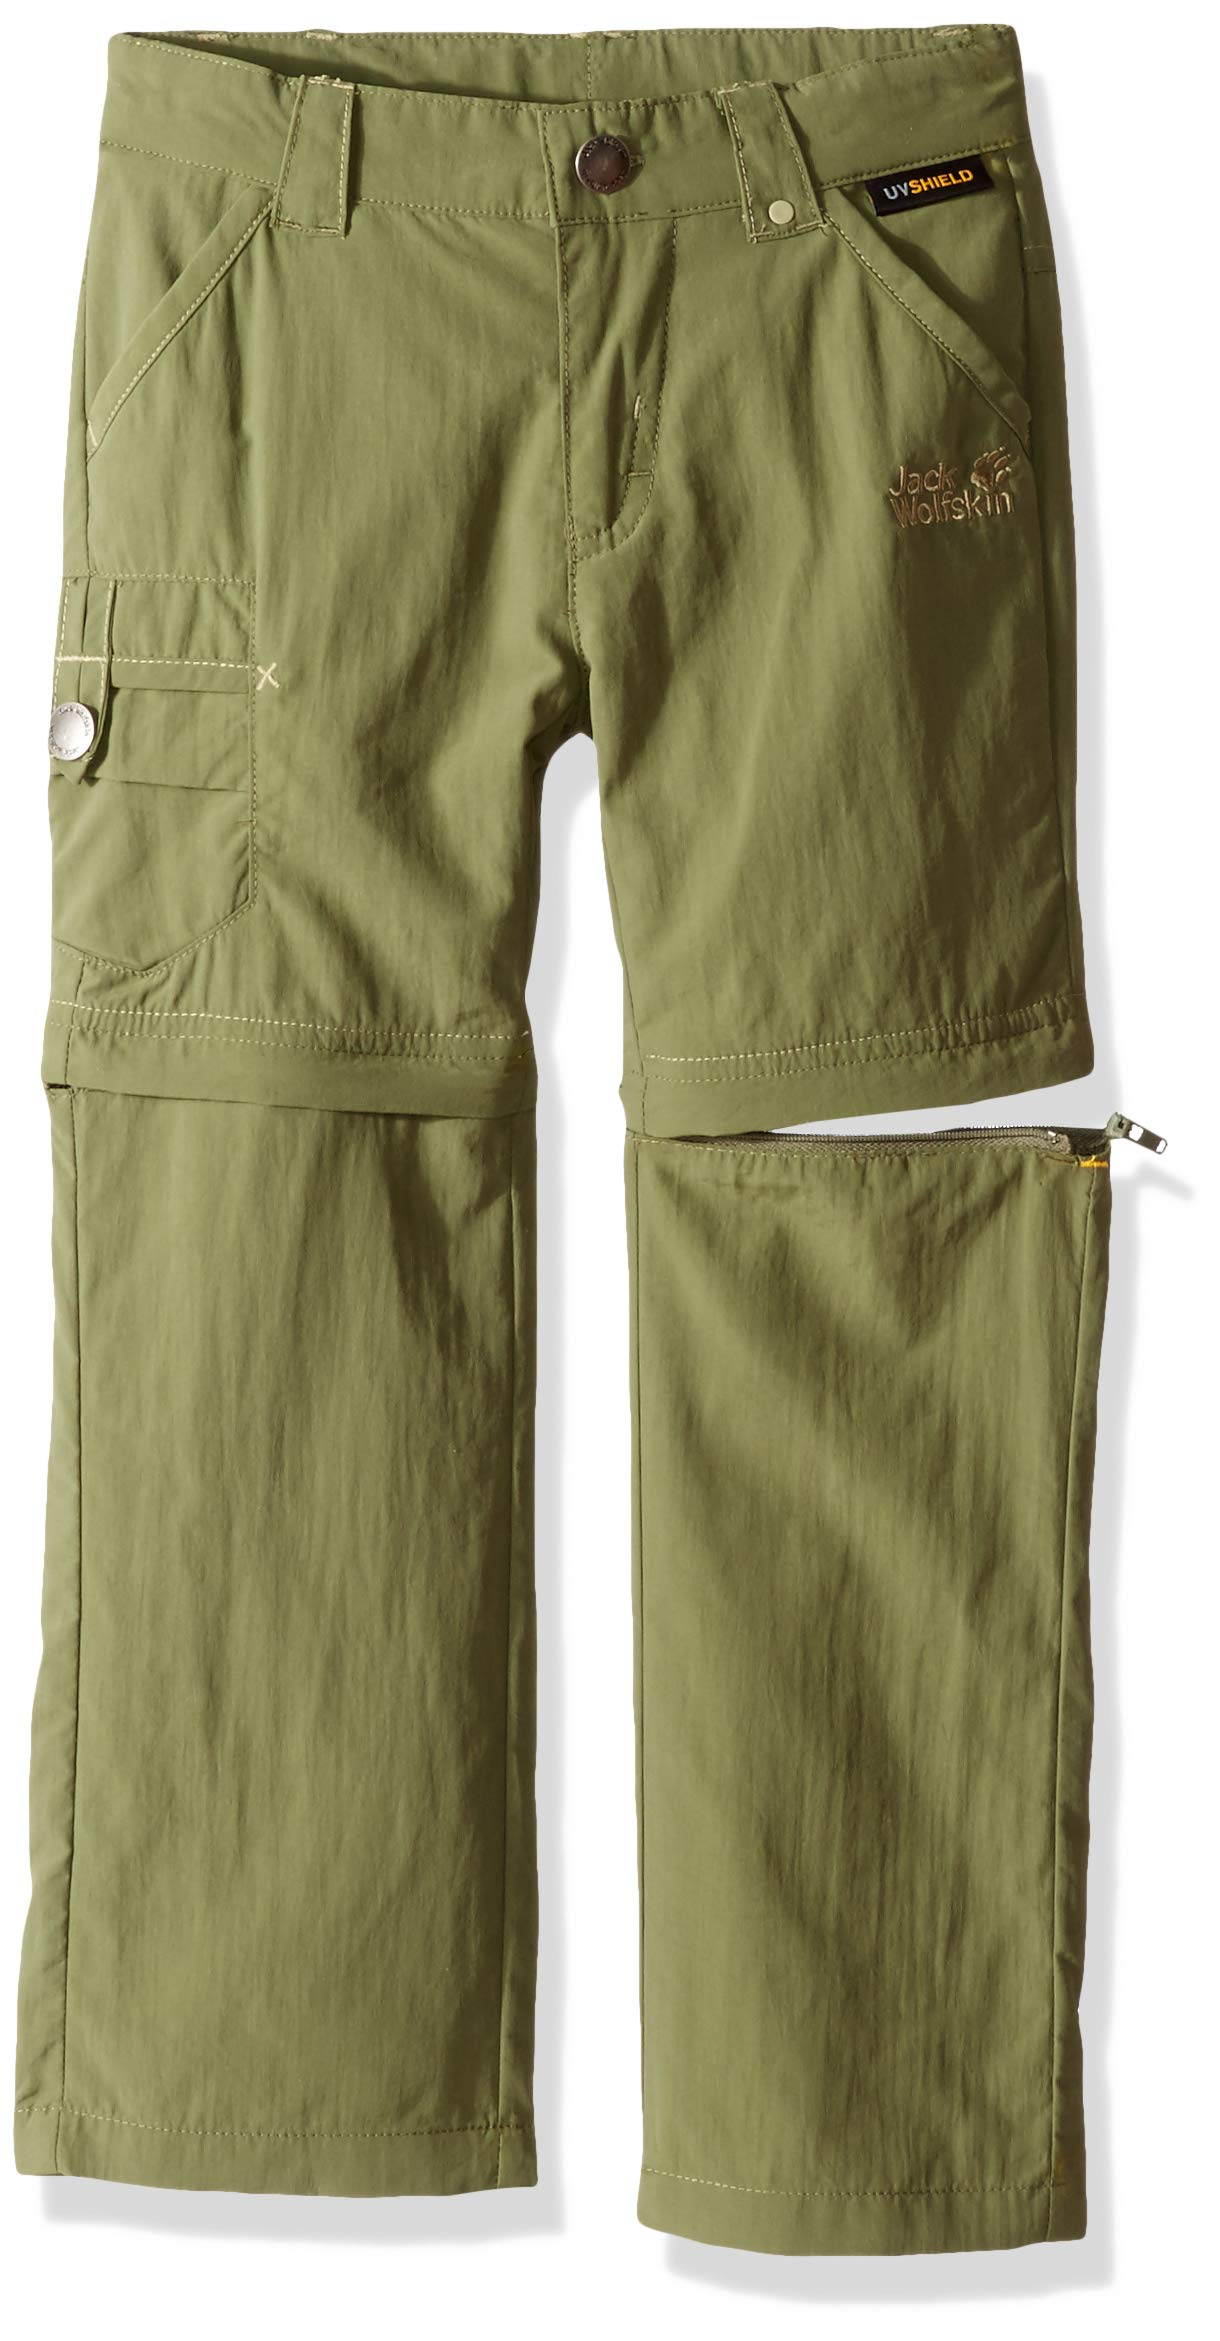 Jack Wolfskin Safari Zip Off Pants K Pants, 140 (9-10 Years Old), Woodland Green